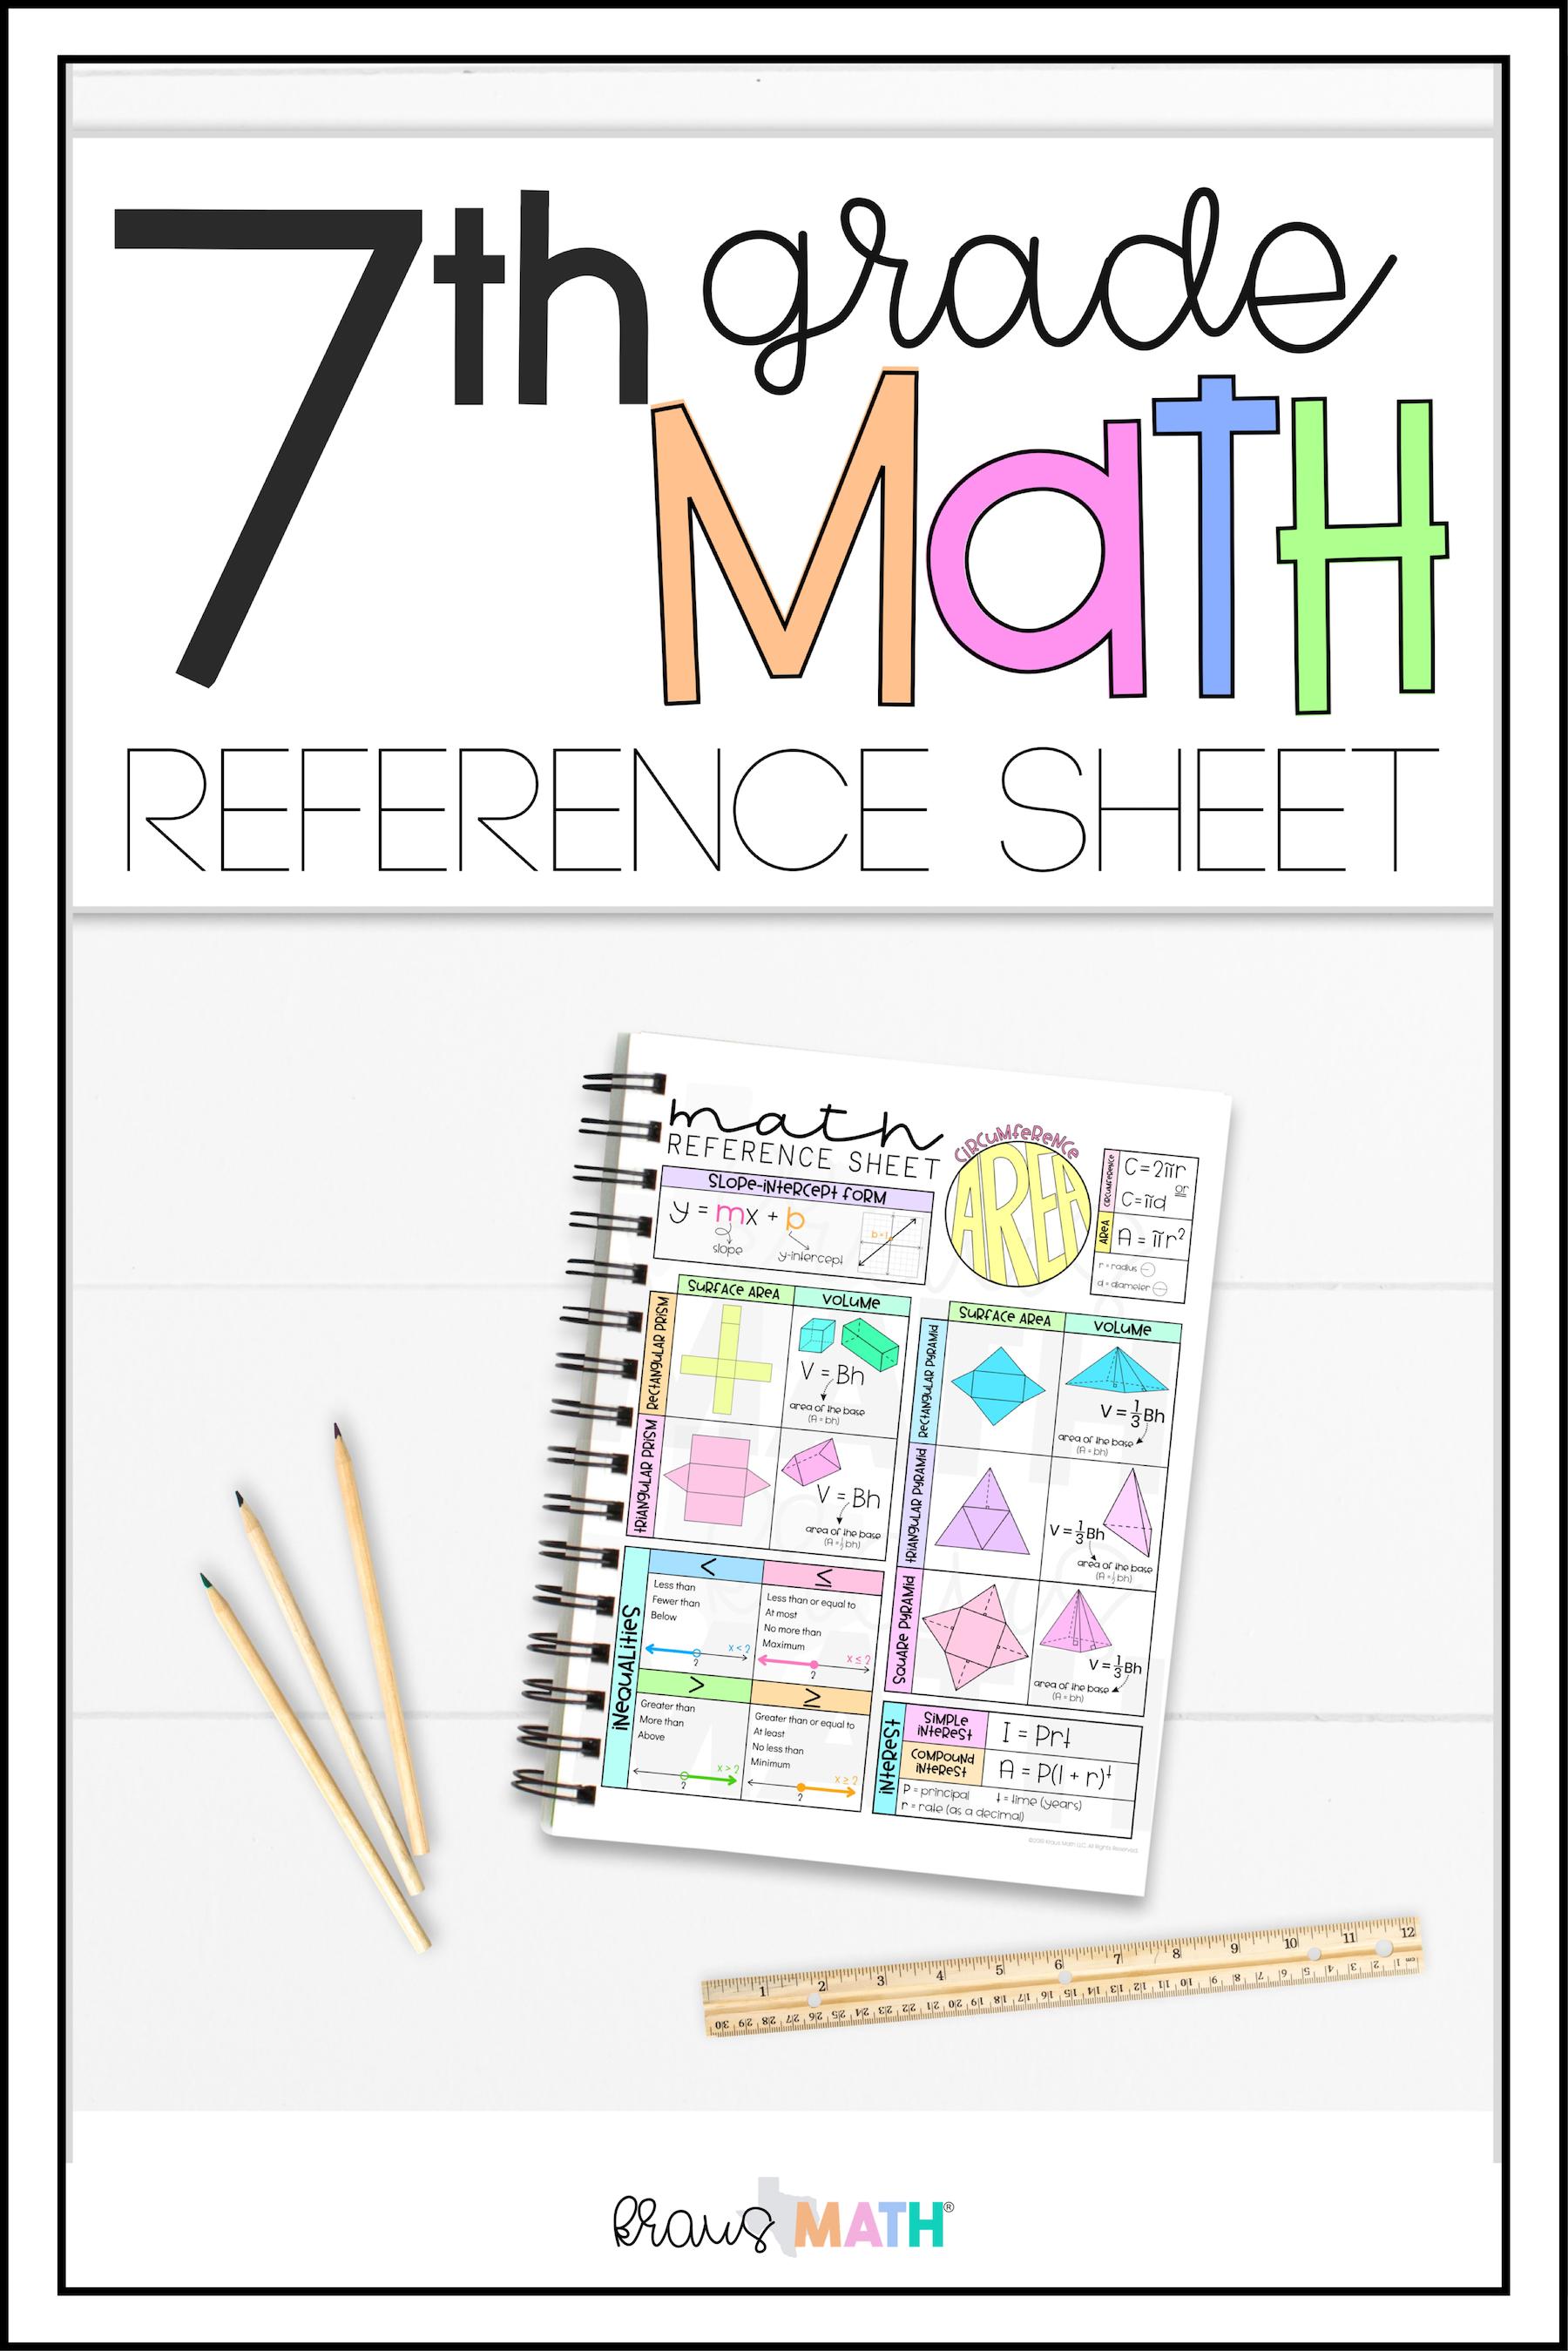 7th Grade Math Reference Sheet Kraus Math Math Reference Sheet 7th Grade Math Middle School Math [ 2699 x 1800 Pixel ]